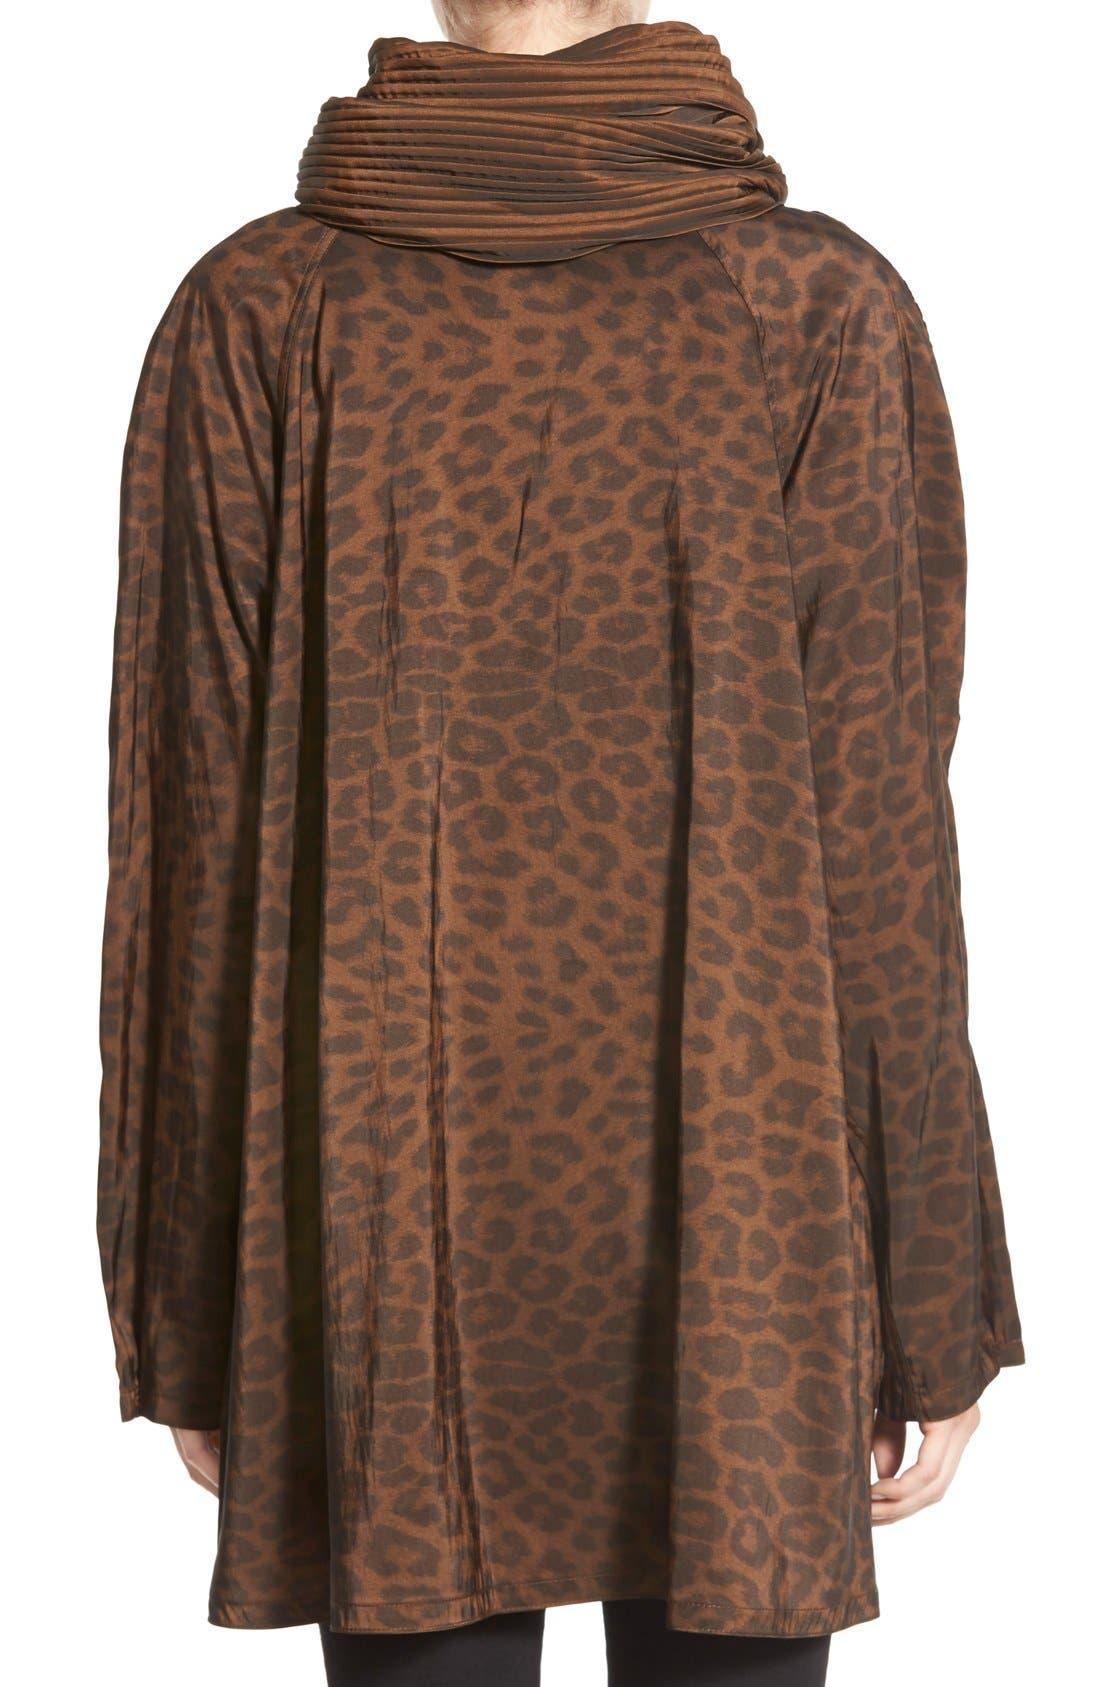 'Mini Donatella Leopard' Reversible Pleat Hood Packable Travel Coat,                             Alternate thumbnail 9, color,                             202